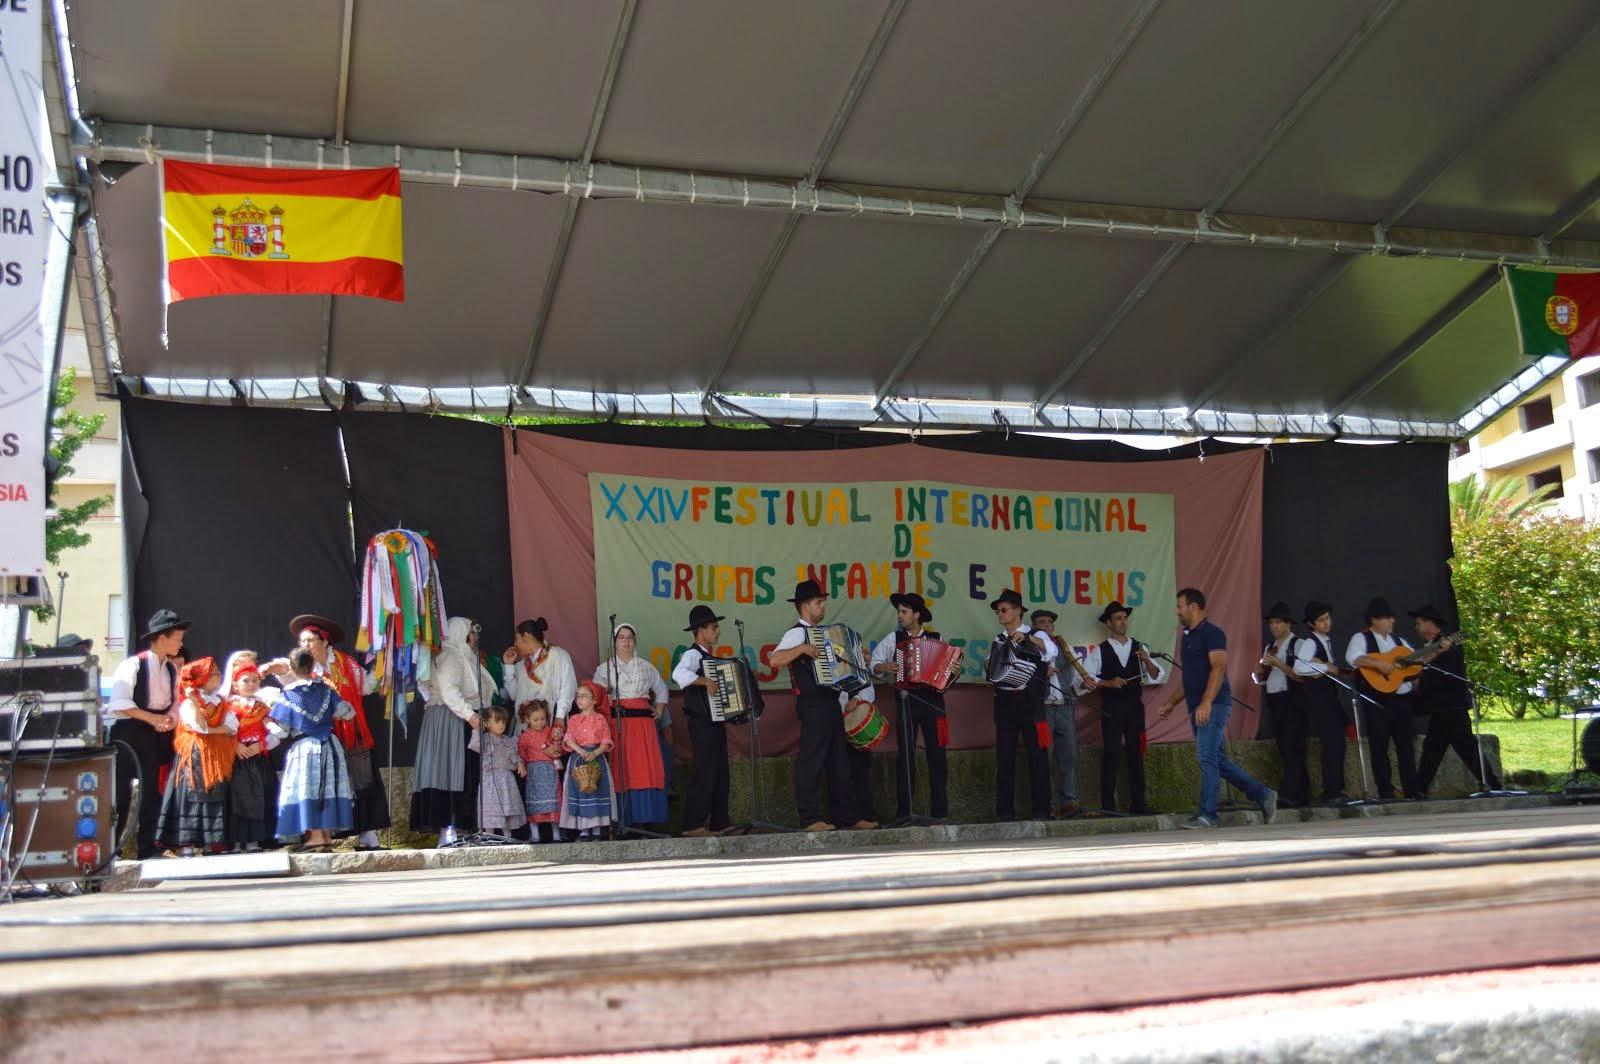 XXIV Festival do Grupo